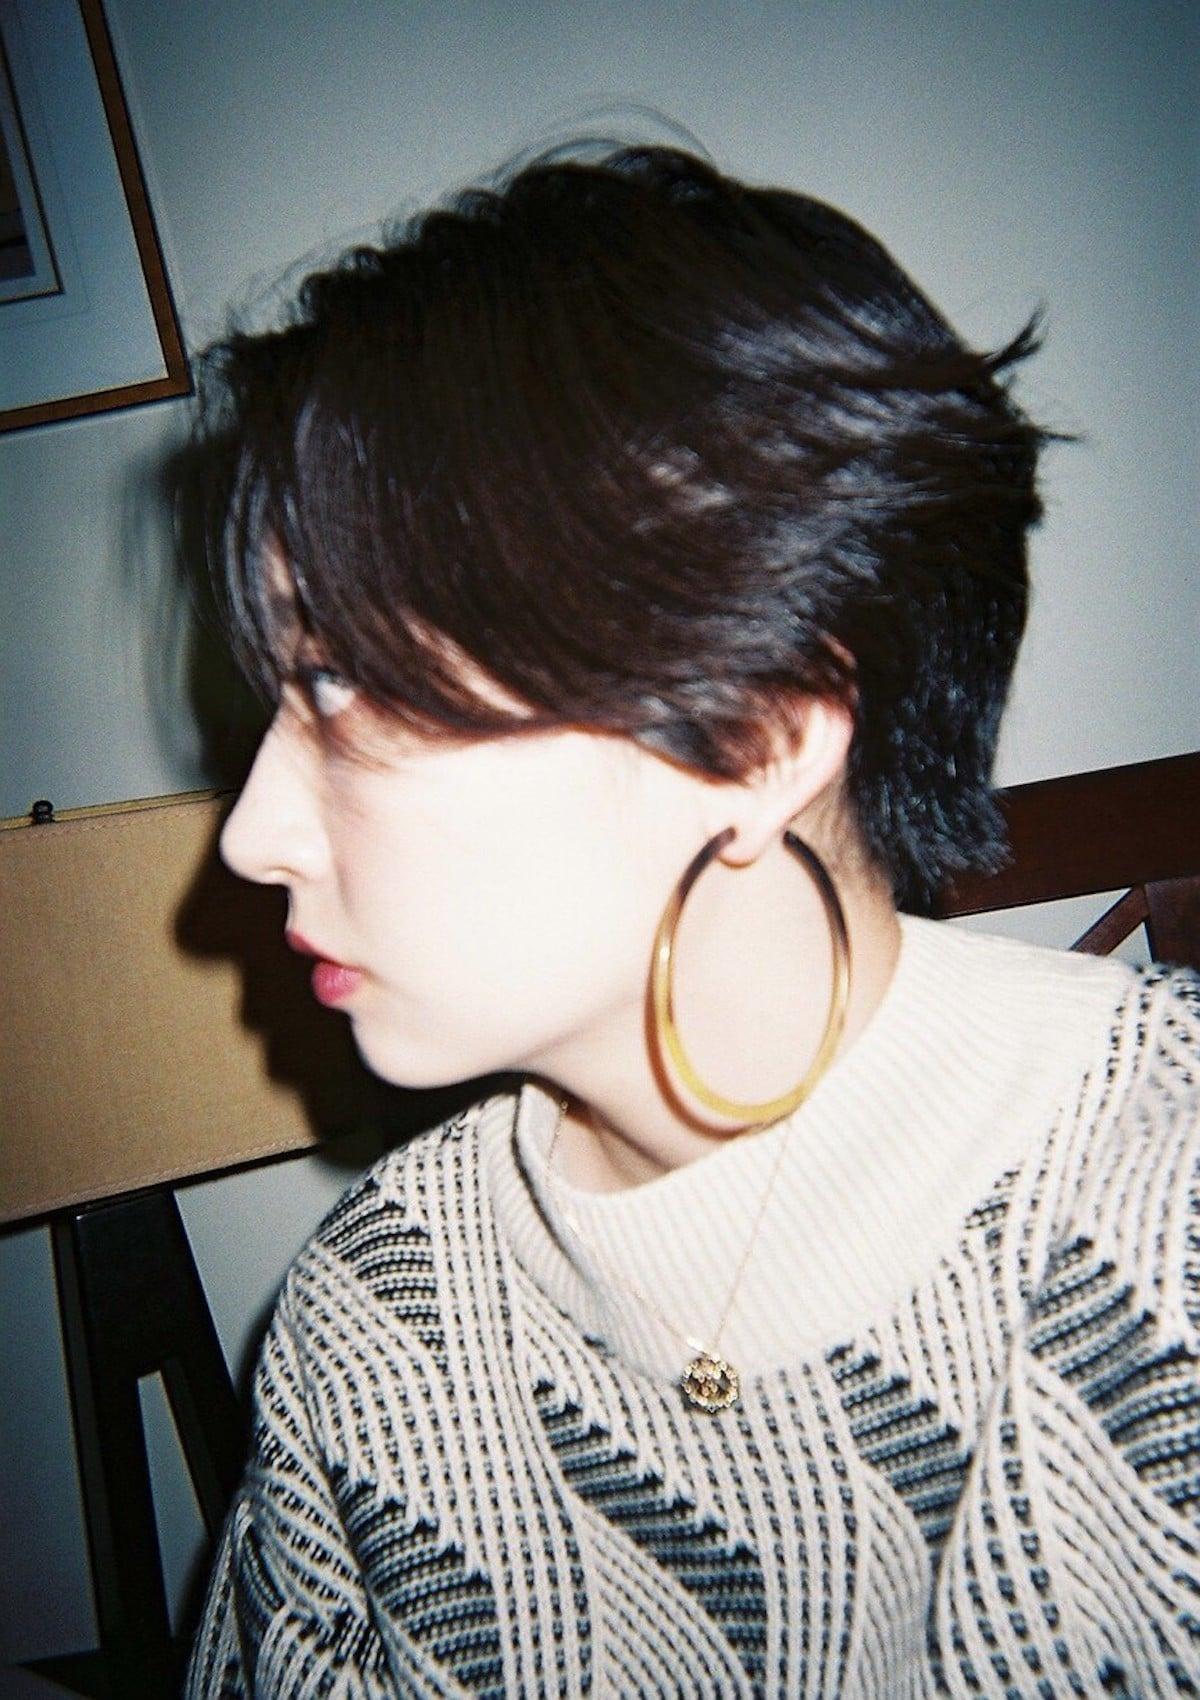 TOSHIKI HAYASHI(%C)が「TIME IS OVER EP」をリリース|BASI、鈴木真海子、万寿、maco marets、kyoh3i(Kanomaker)が参加 music190416-toshiki-hayashi-4-1200x1700